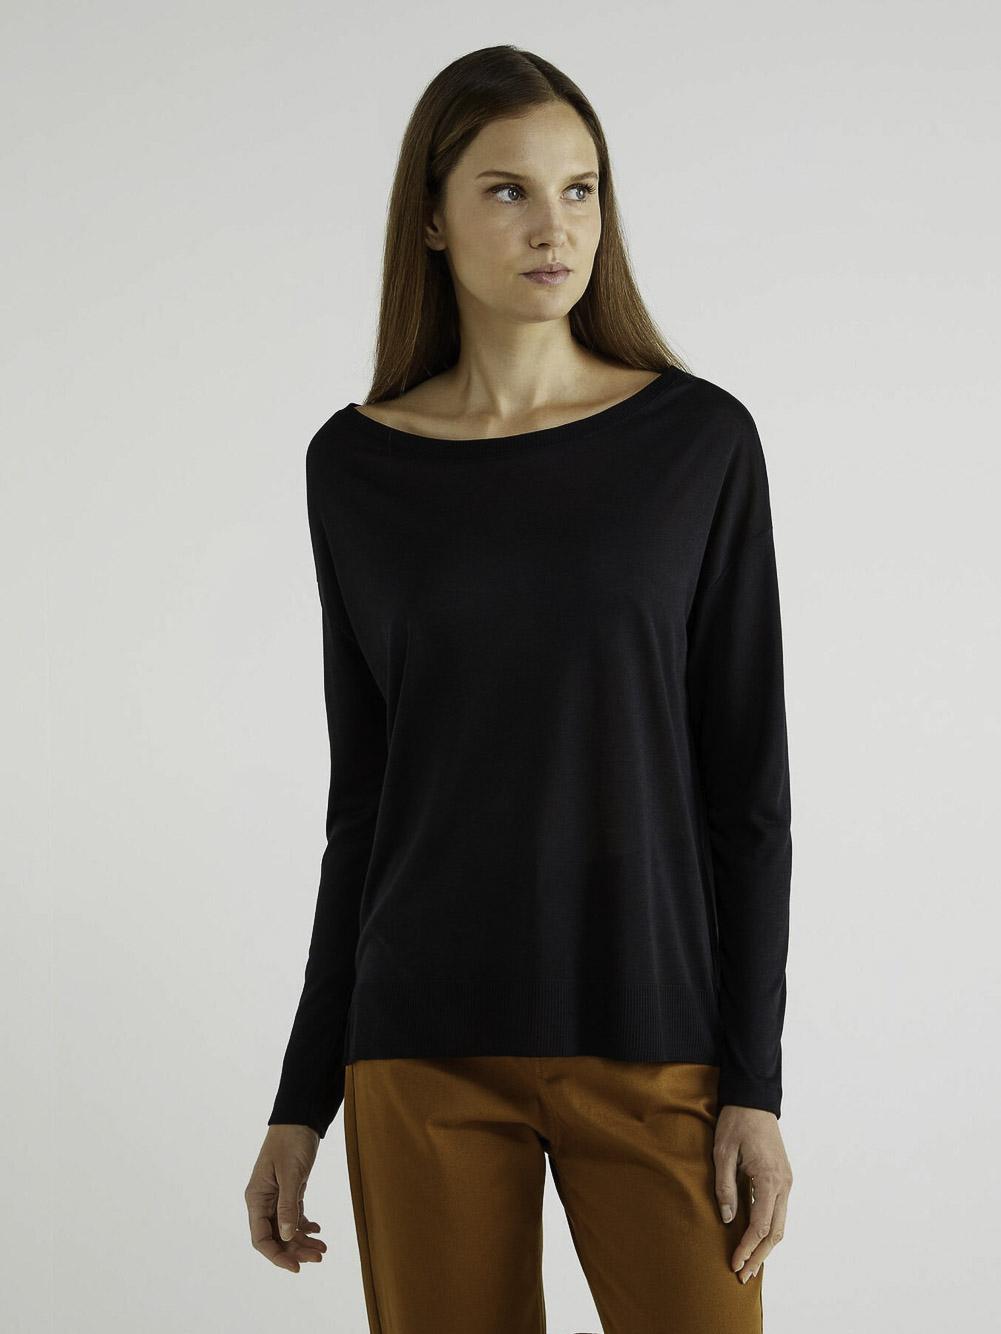 BENETTON T-shirt μακρυμάνικο από lyocell 3ACRE11E6 20A100